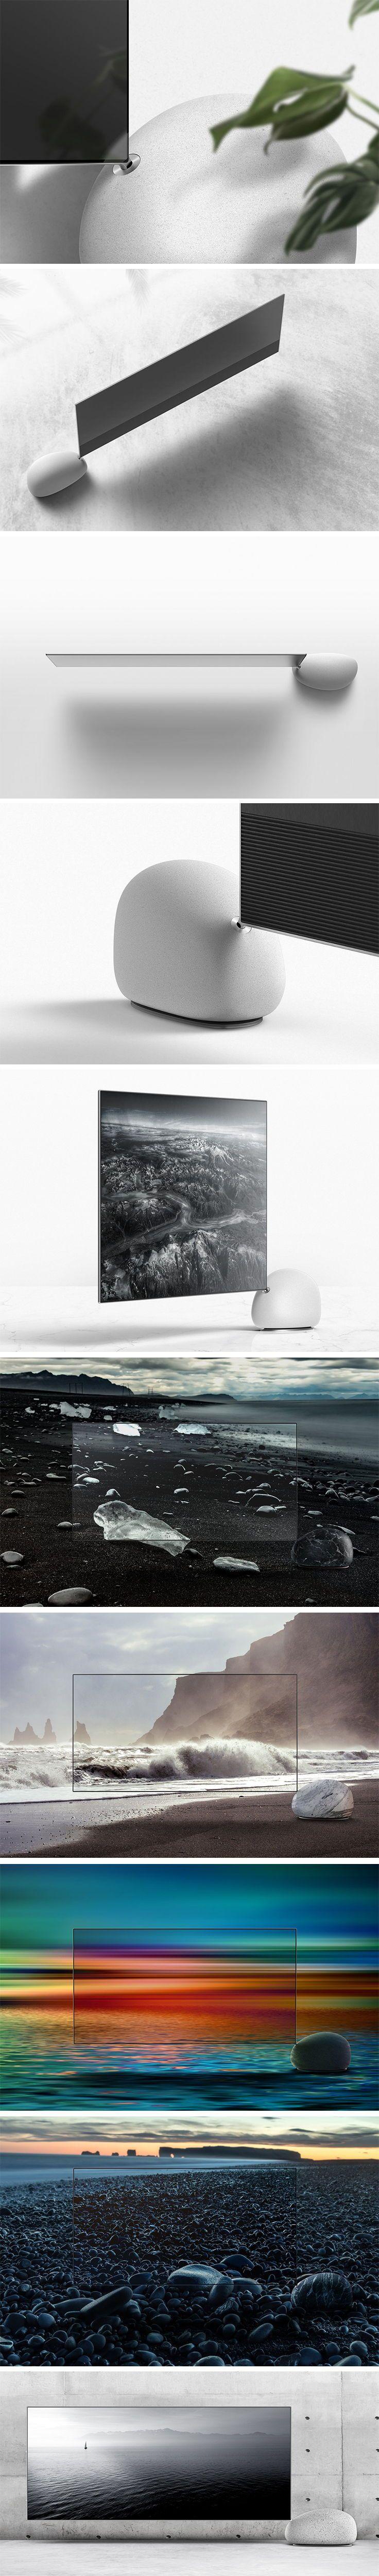 2554 best Product Design images on Pinterest